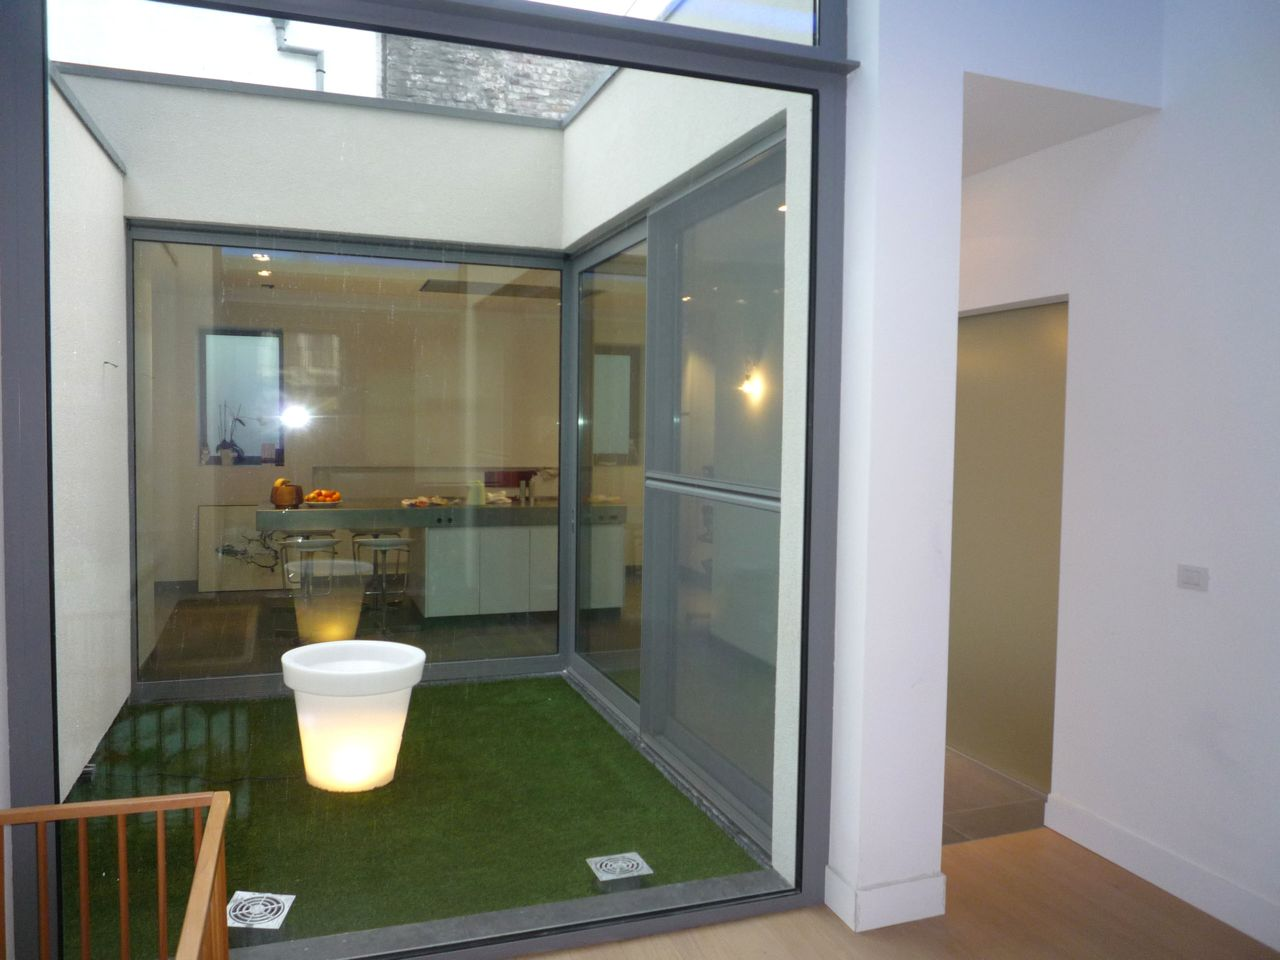 P1050555 | Baeyens & Beck architecten Gent | architect nieuwbouw renovatie interieur | high end | architectenbureau